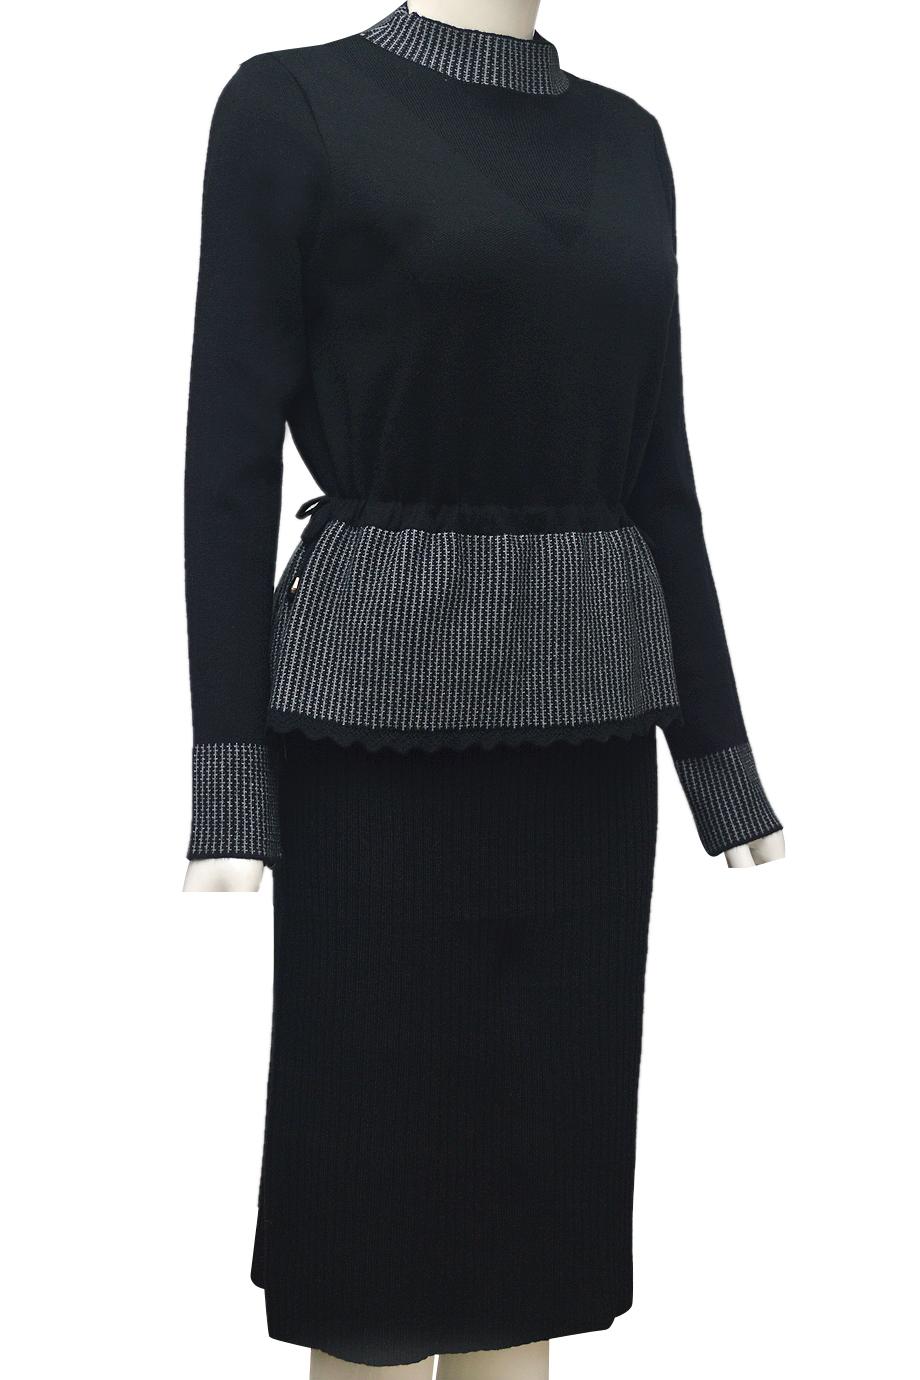 Váy len thời trang ELMI cao cấp màu đen EV45-1